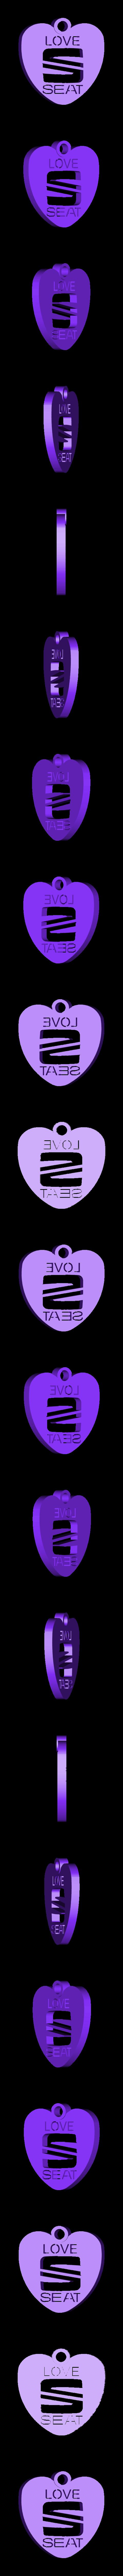 SEAT-Love.stl Download free STL file SEAT key ring • 3D printer design, Pegazepi